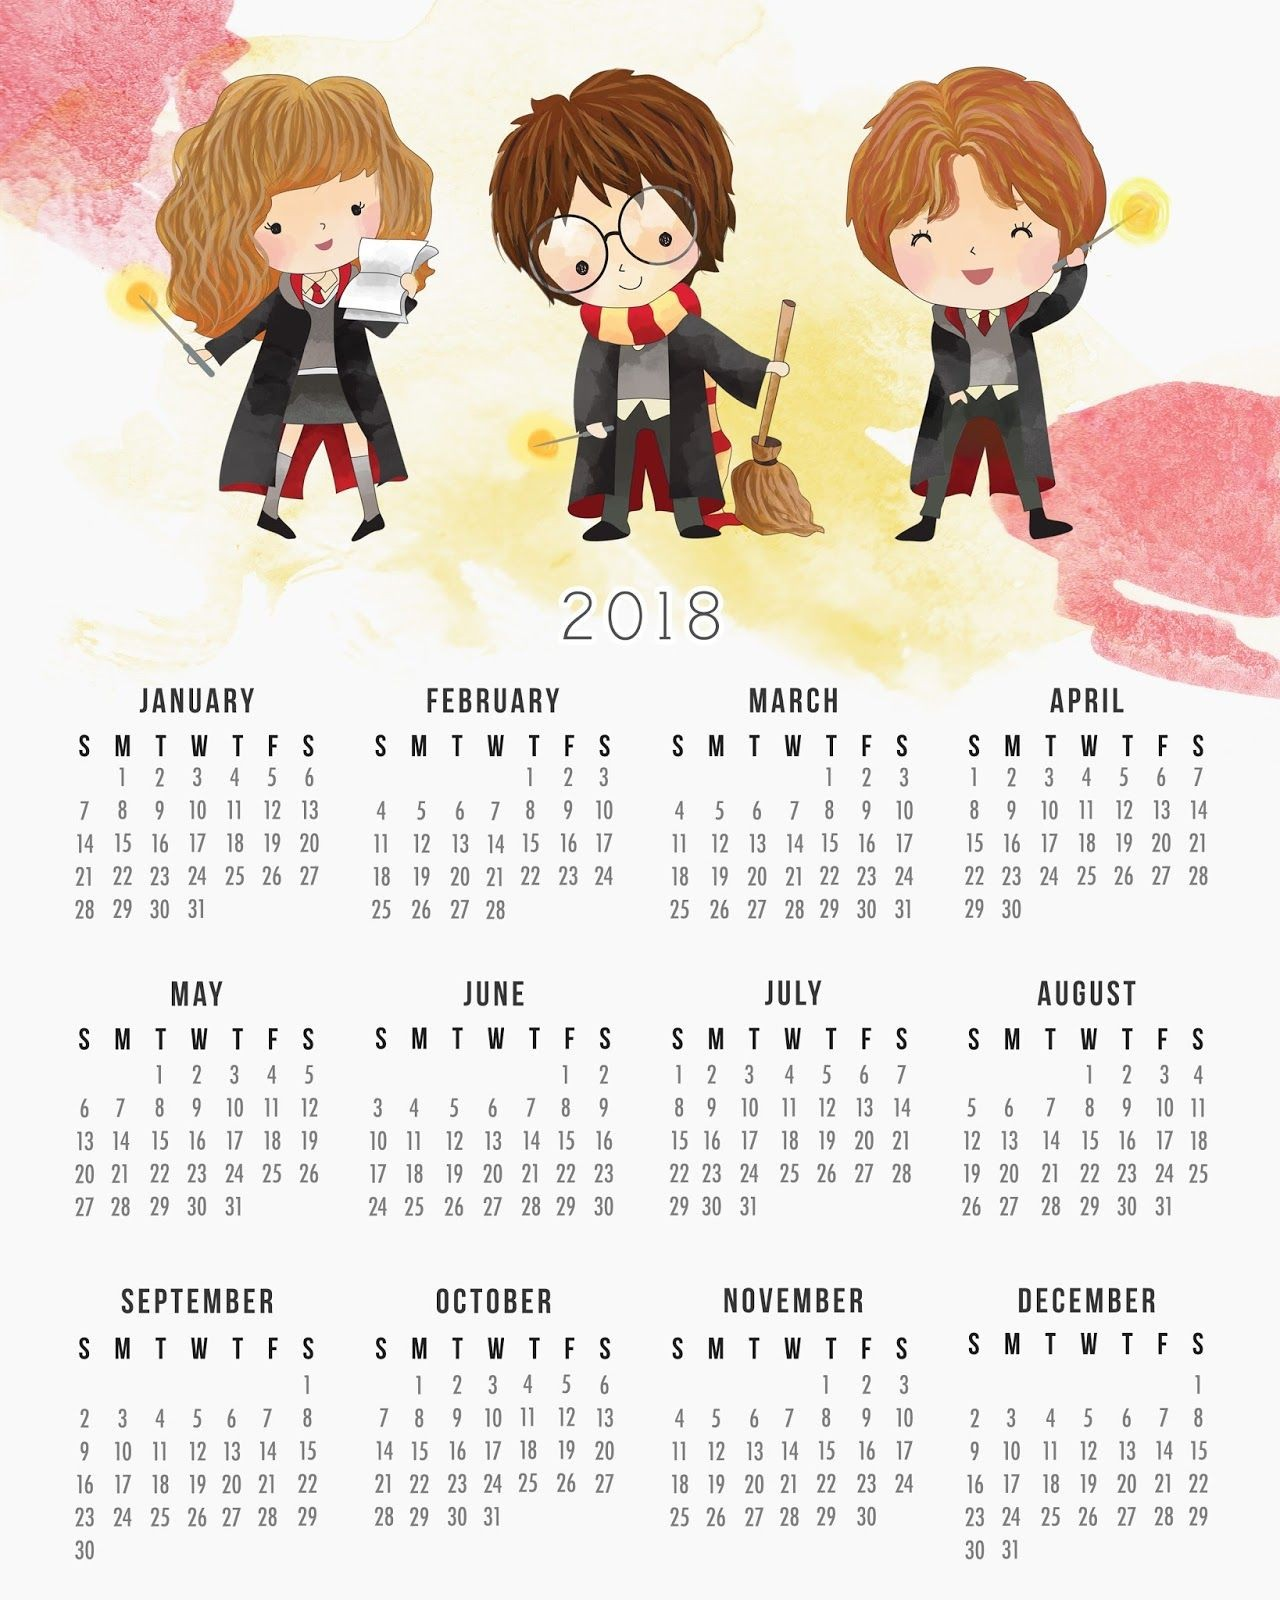 Calendario Lunar Para Imprimir 2017 Más Arriba-a-fecha Harry Potter Calendario 2018 Para Imprimir Gratis Of Calendario Lunar Para Imprimir 2017 Más Arriba-a-fecha Calendario De Octubre 2018 Para Imprimir Kordurorddiner